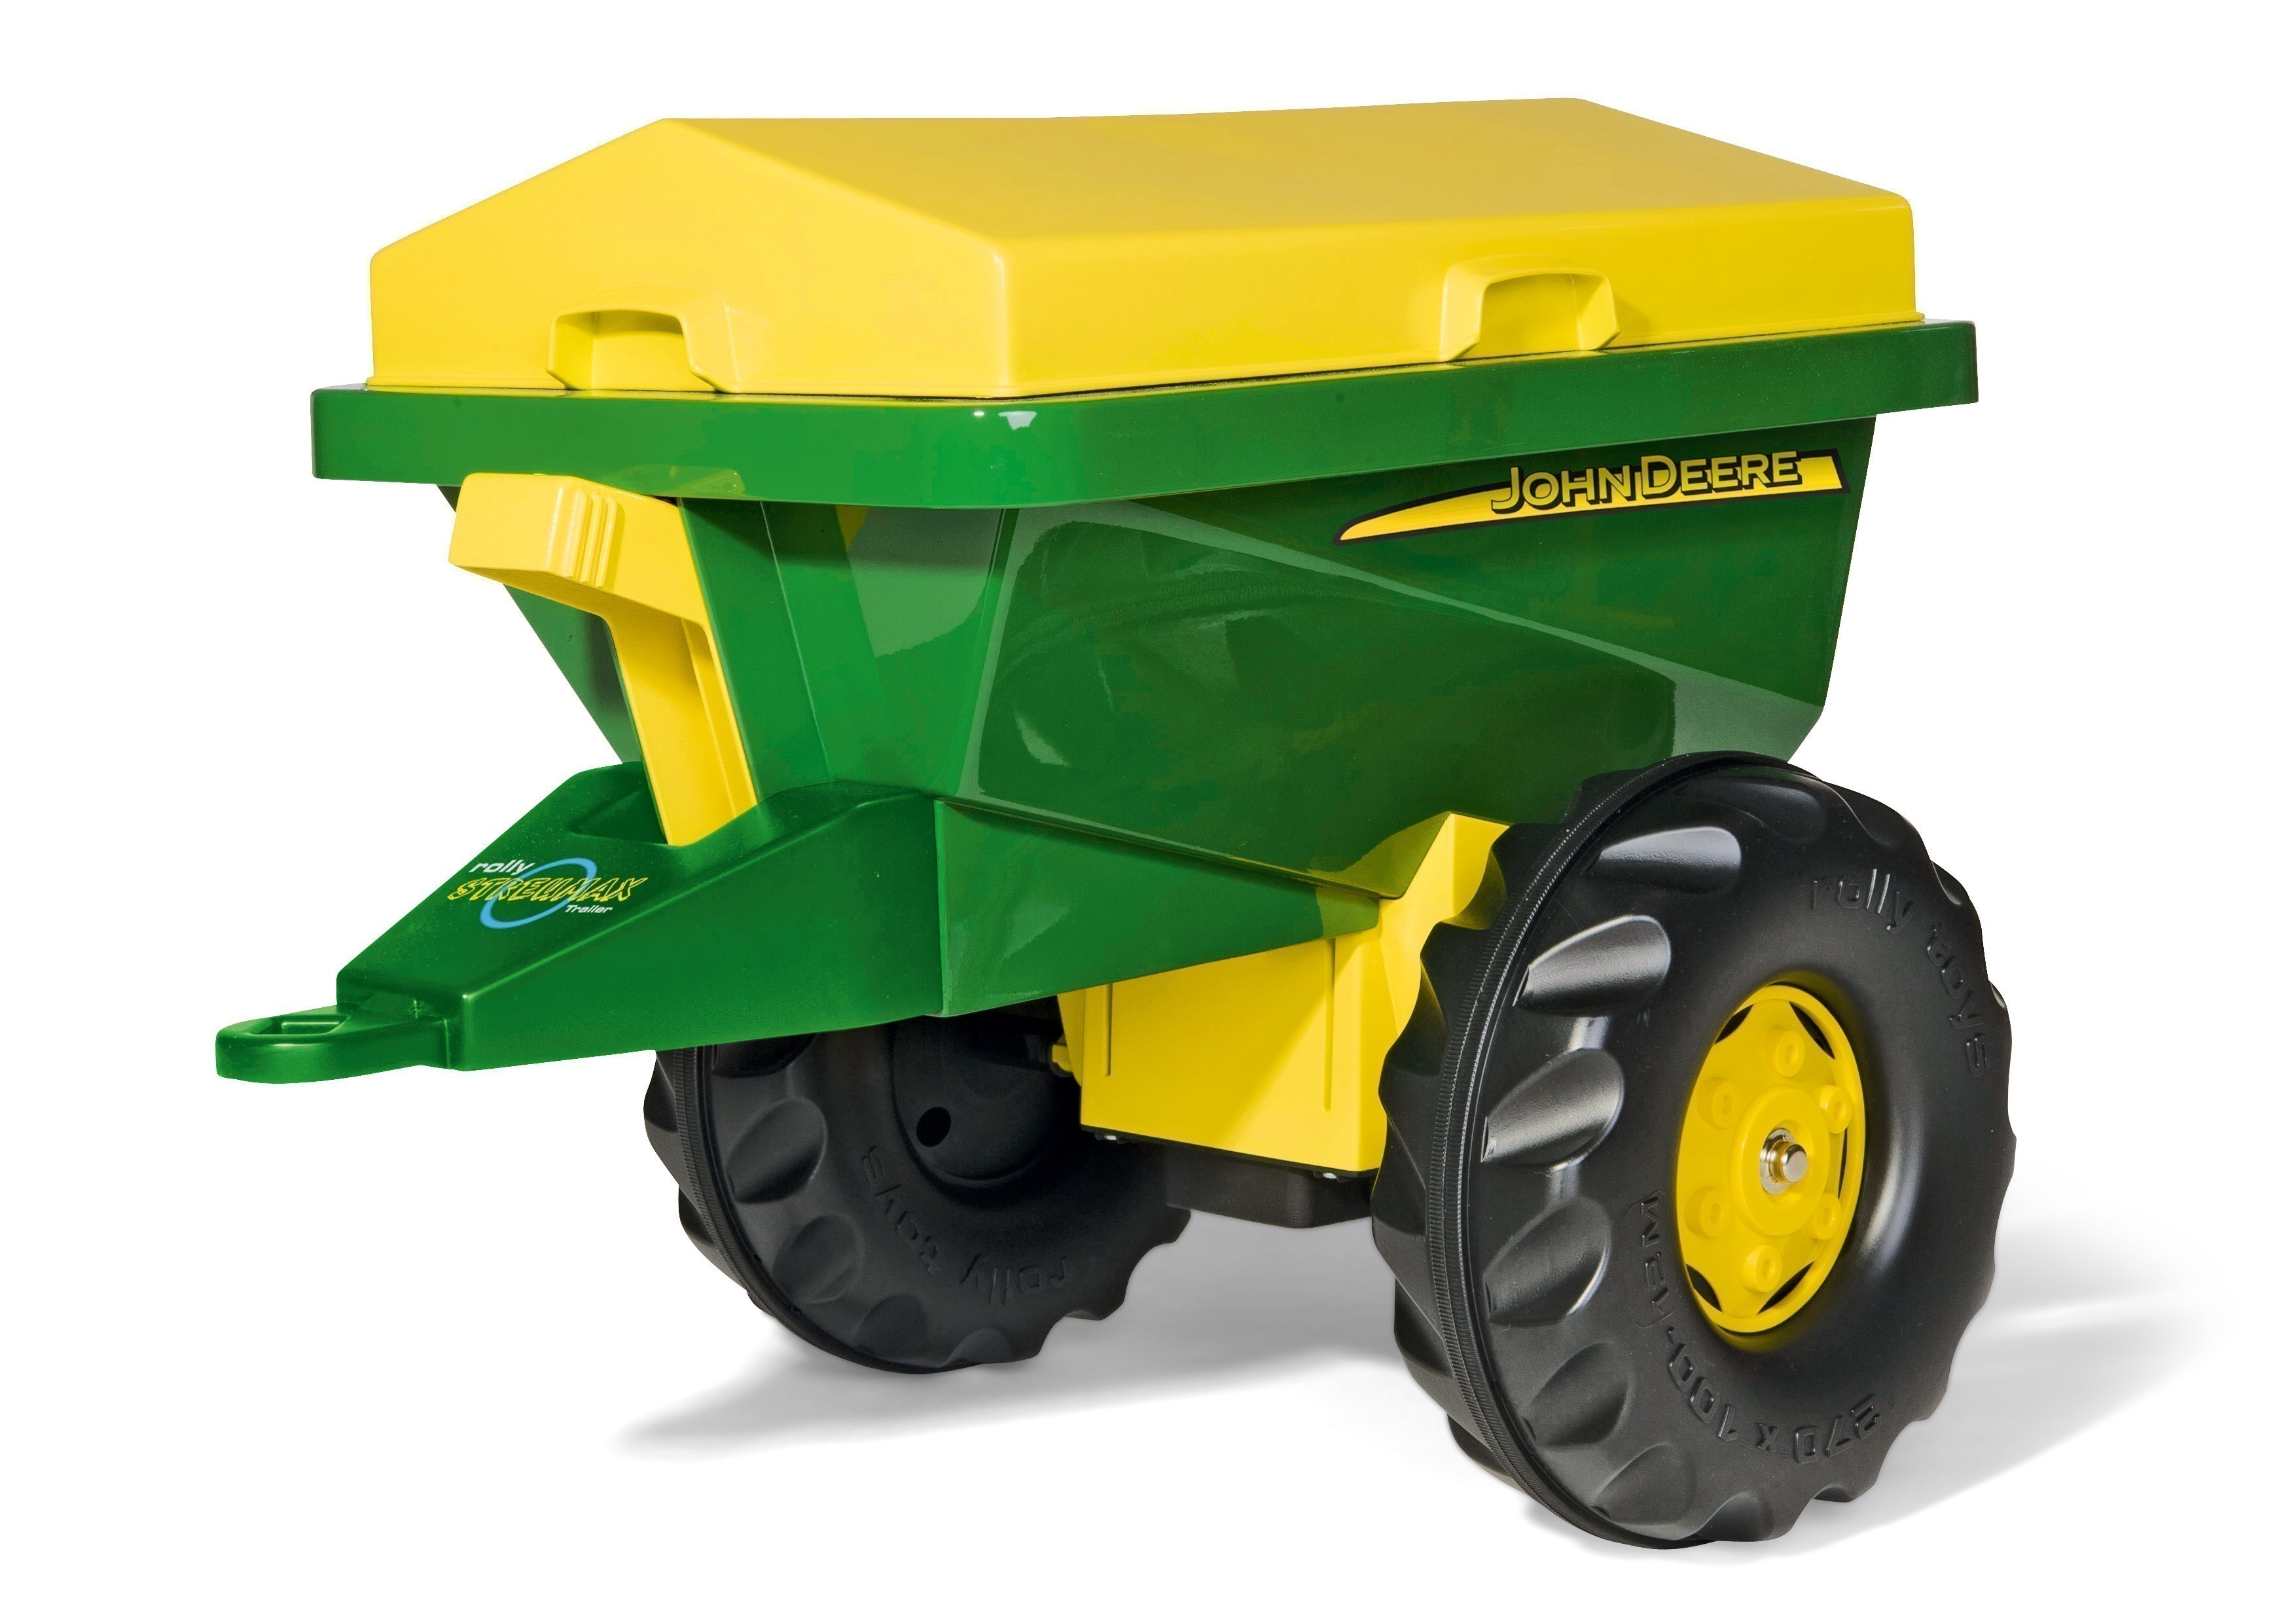 Anhänger für Tretfahrzeug rolly Streumax John Deere - Rolly Toys Bild 1